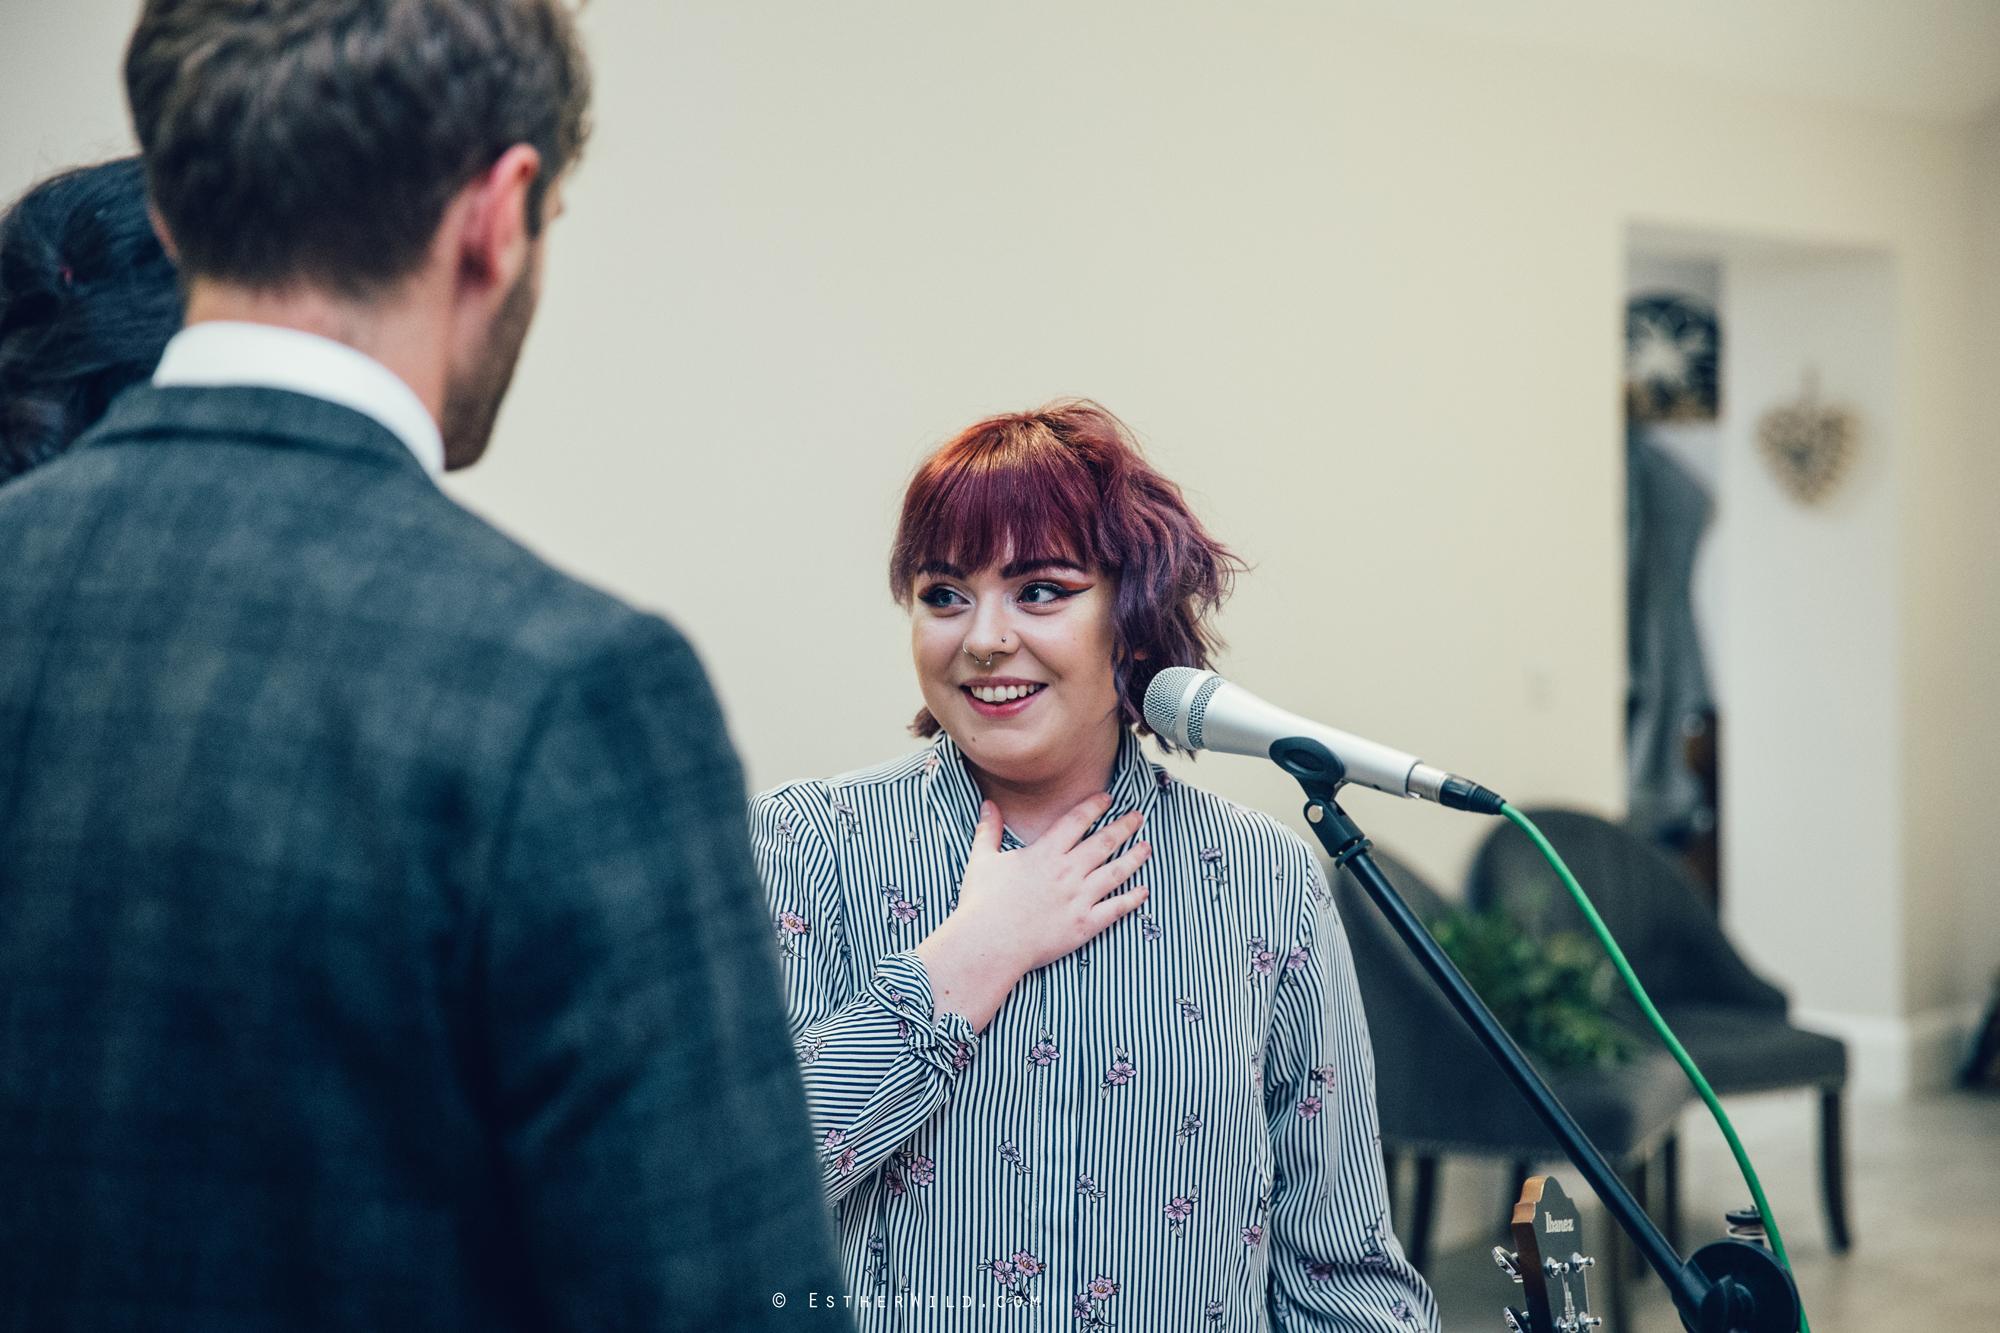 Reading_Room_Weddings_Alby_Norwich_Photographer_Esther_Wild_IMG_2657.jpg